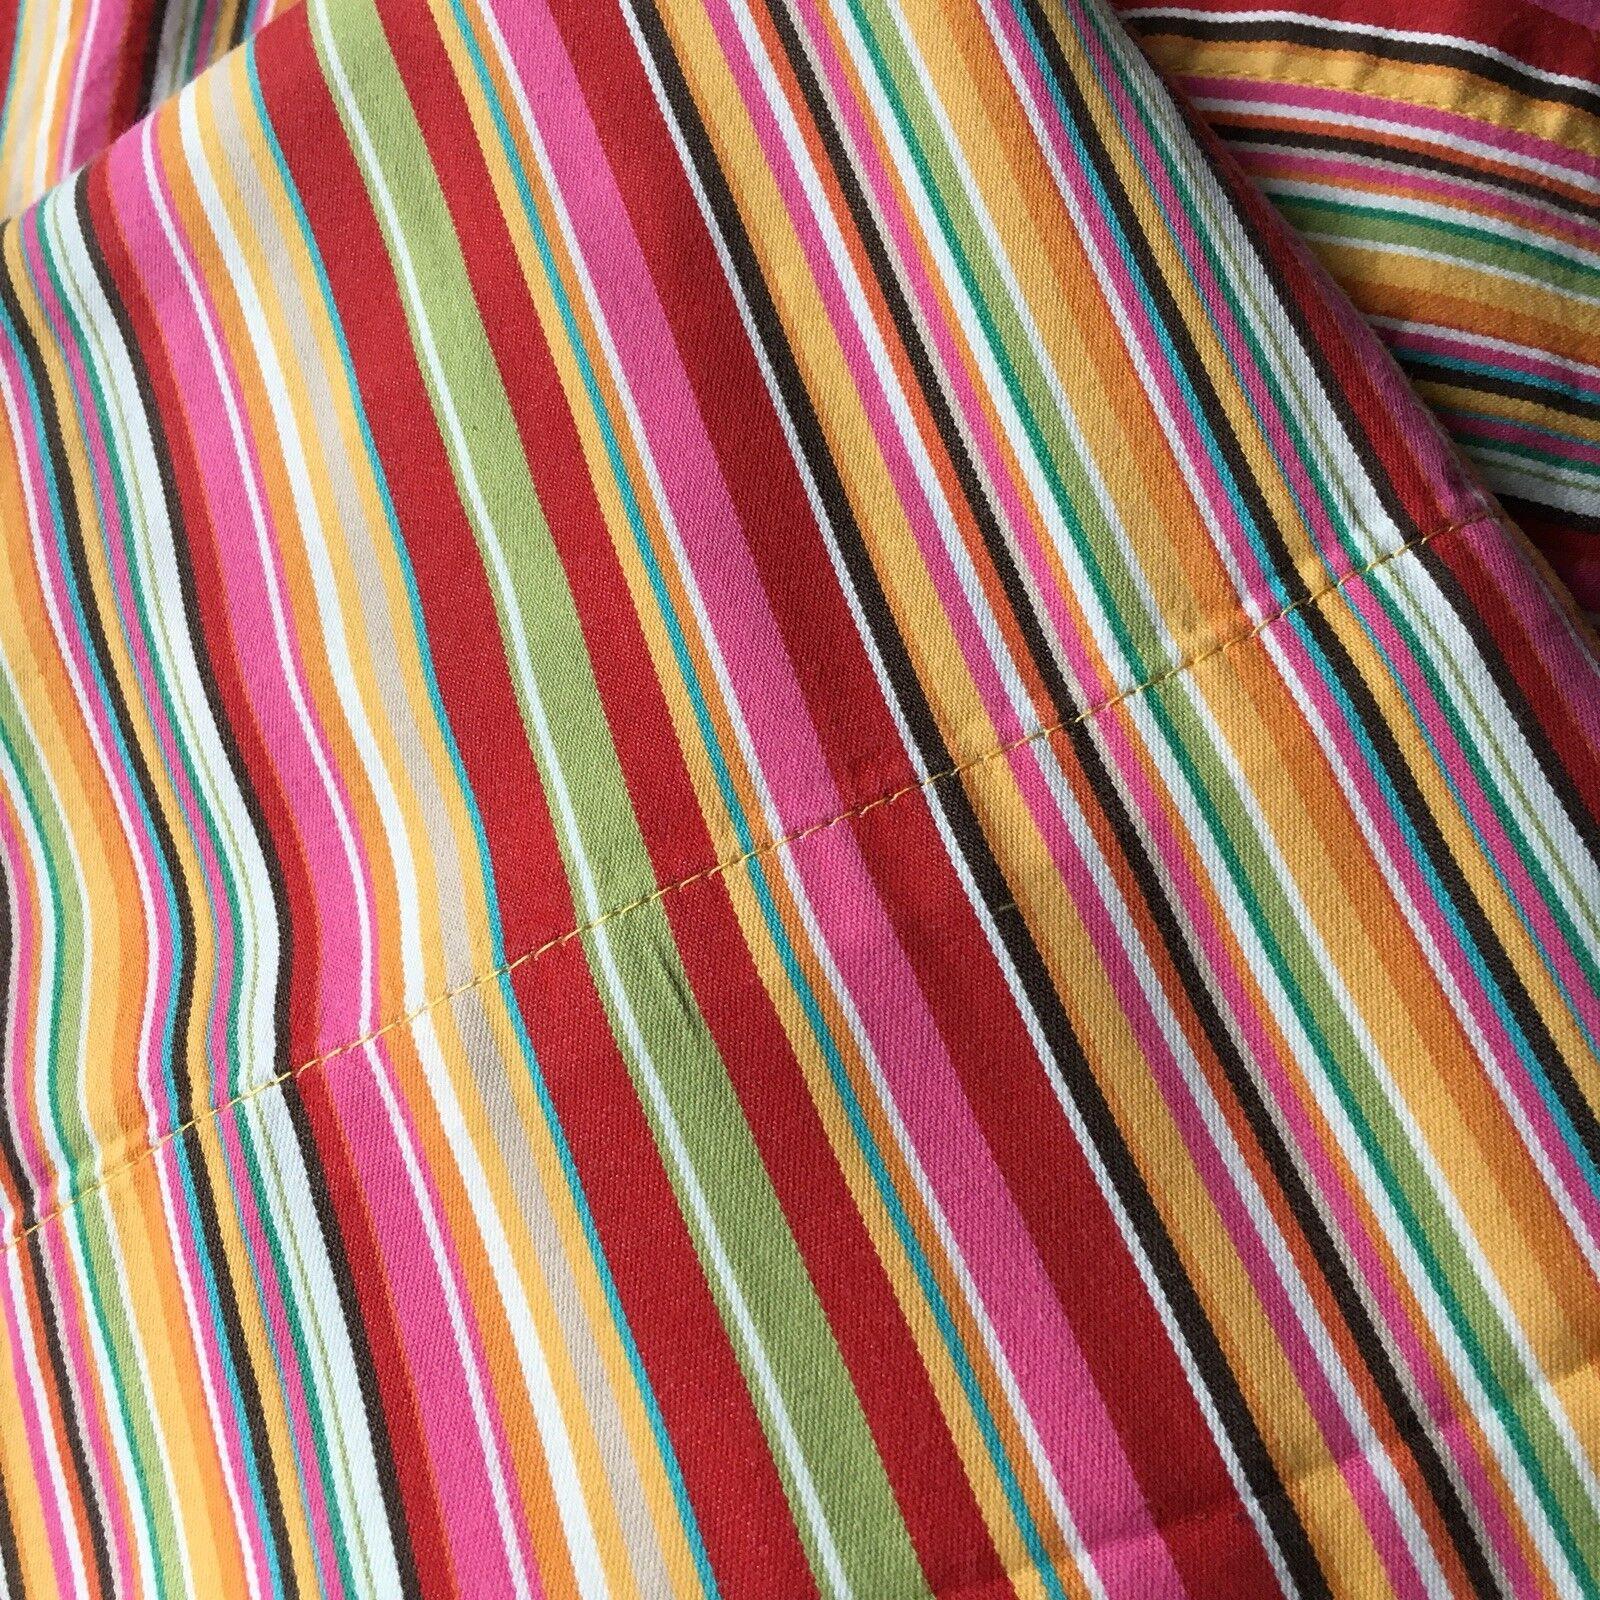 Pottery Barn Twin Sheet Set Stripes Red orange Yellow Pink Portugal